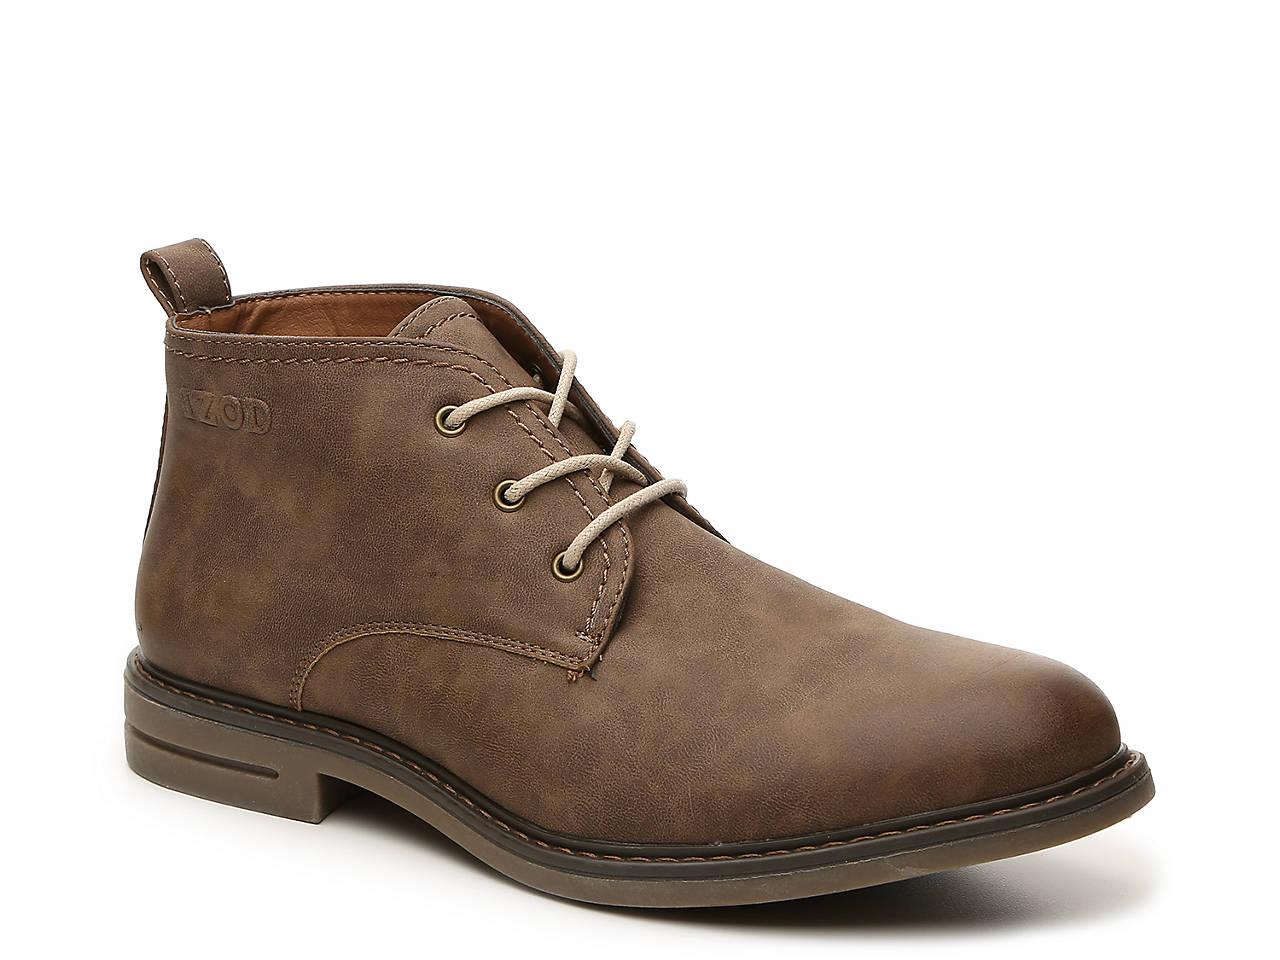 Cally Chukka Boot